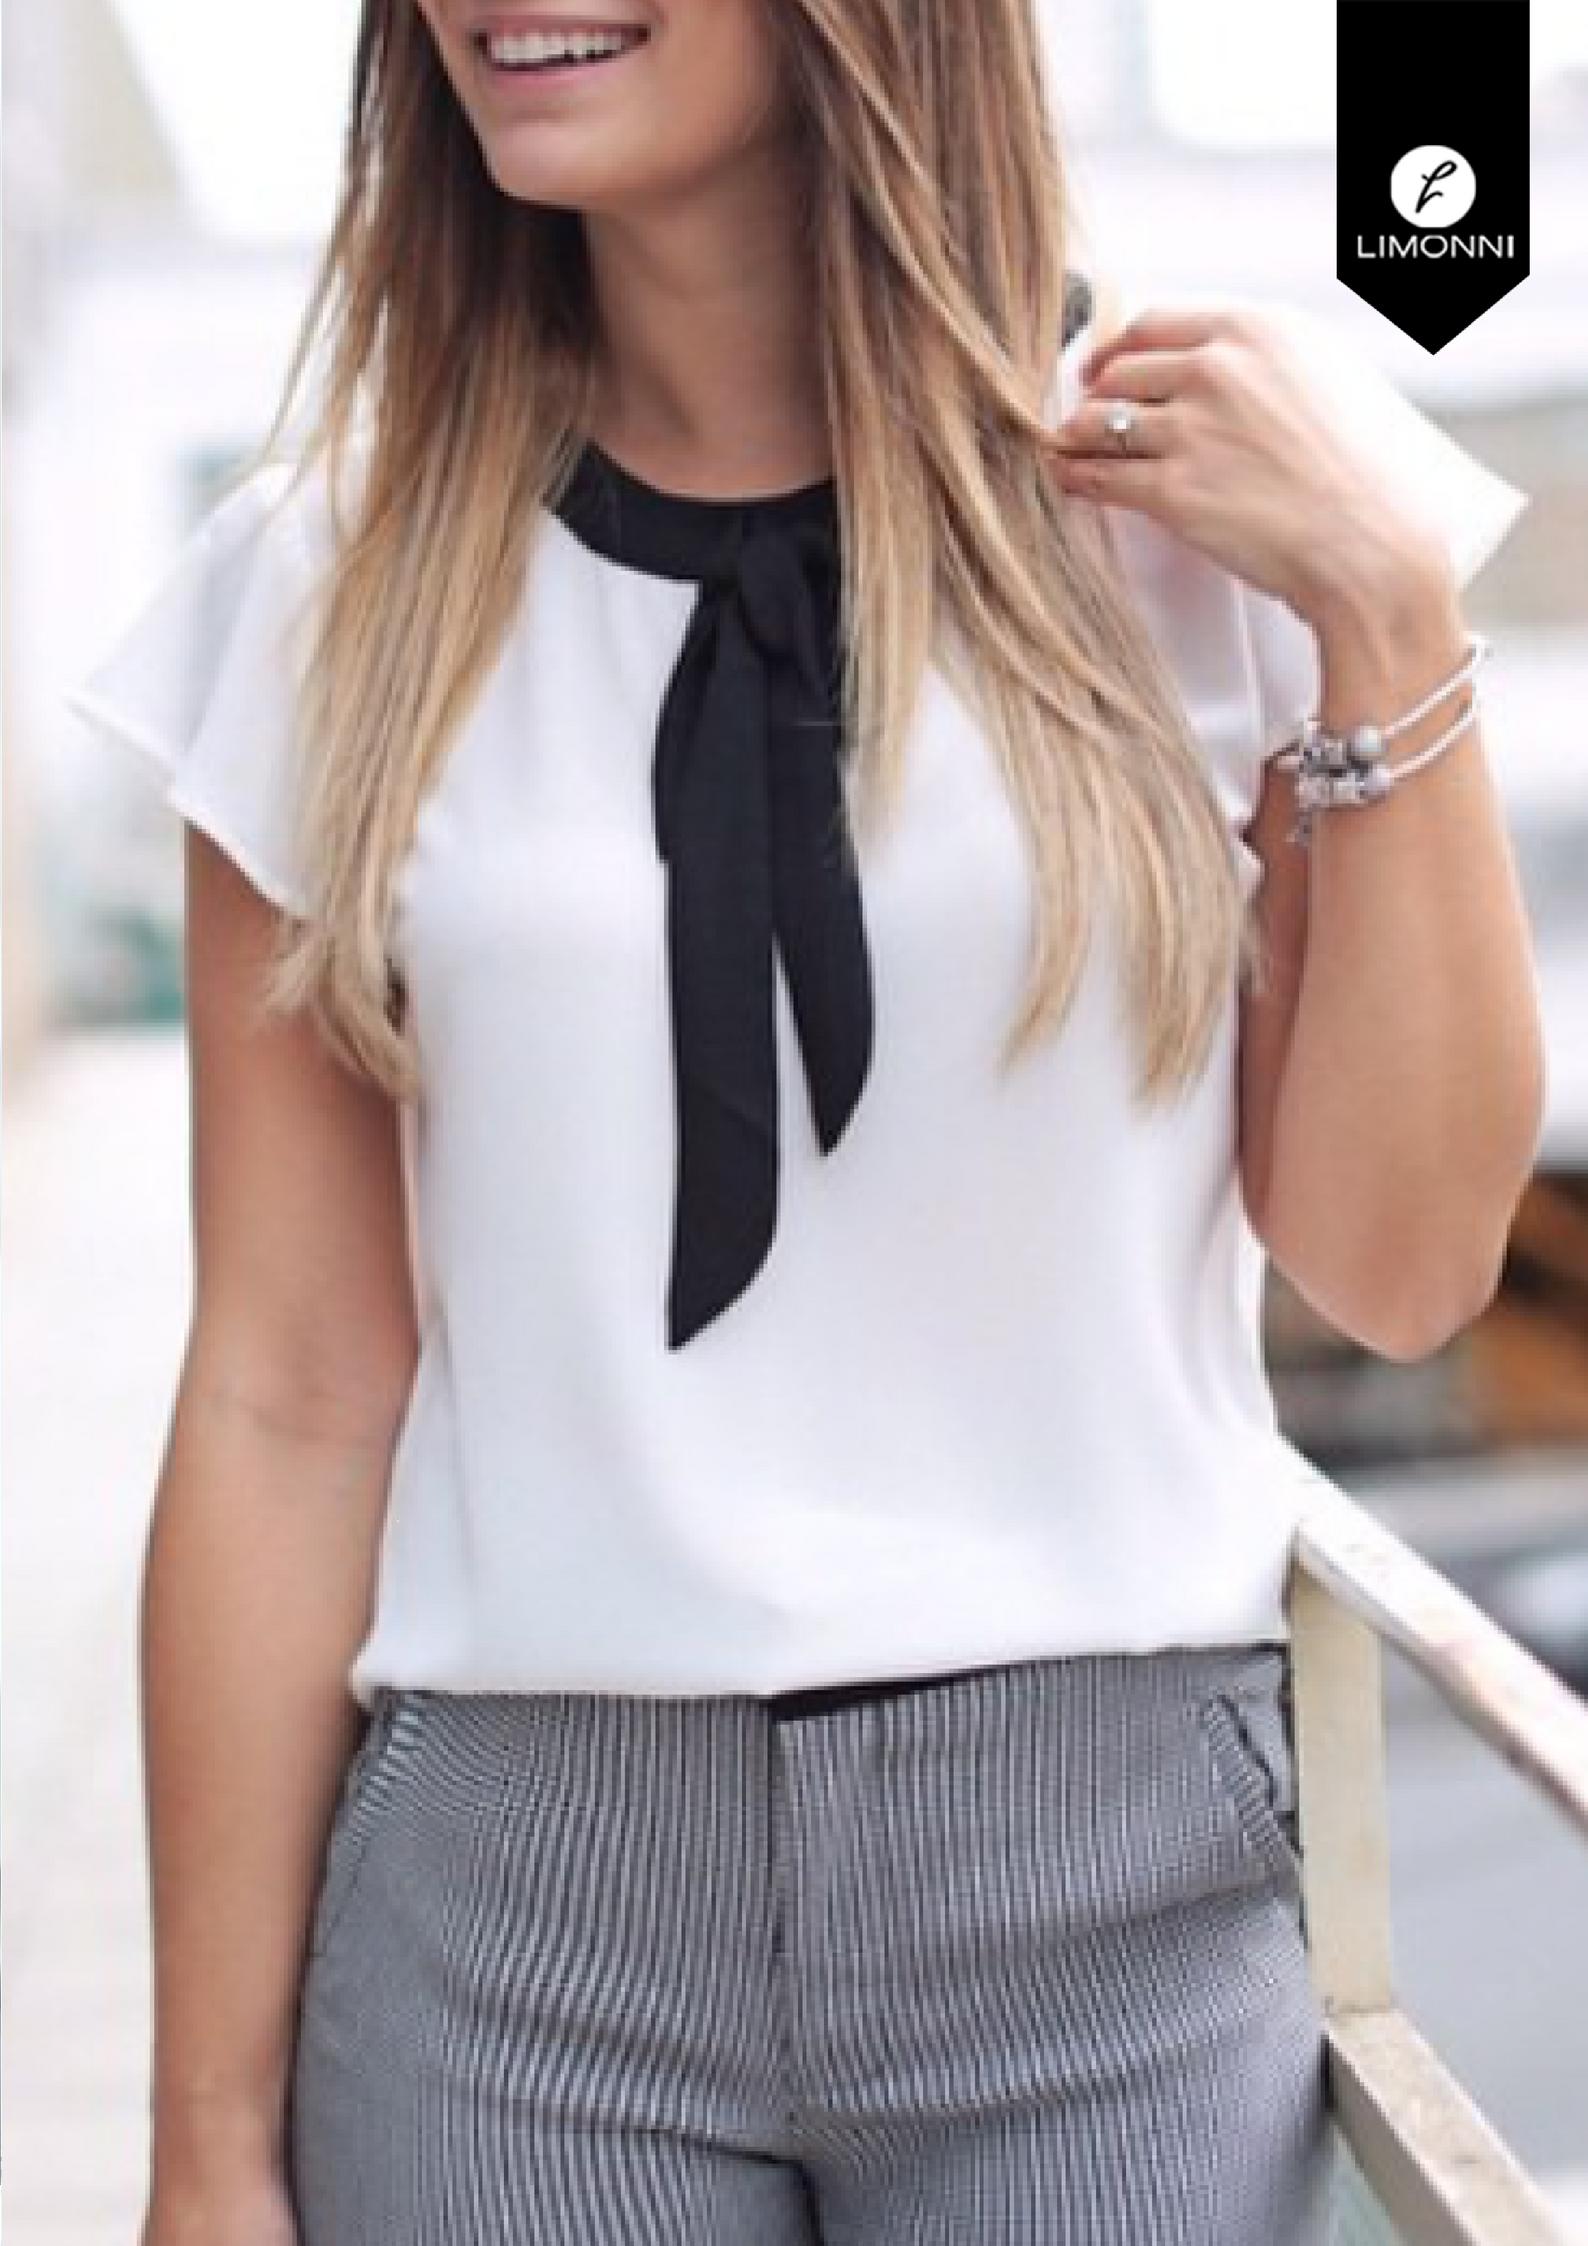 Blusas para mujer Limonni Bennett LI1346 Casuales